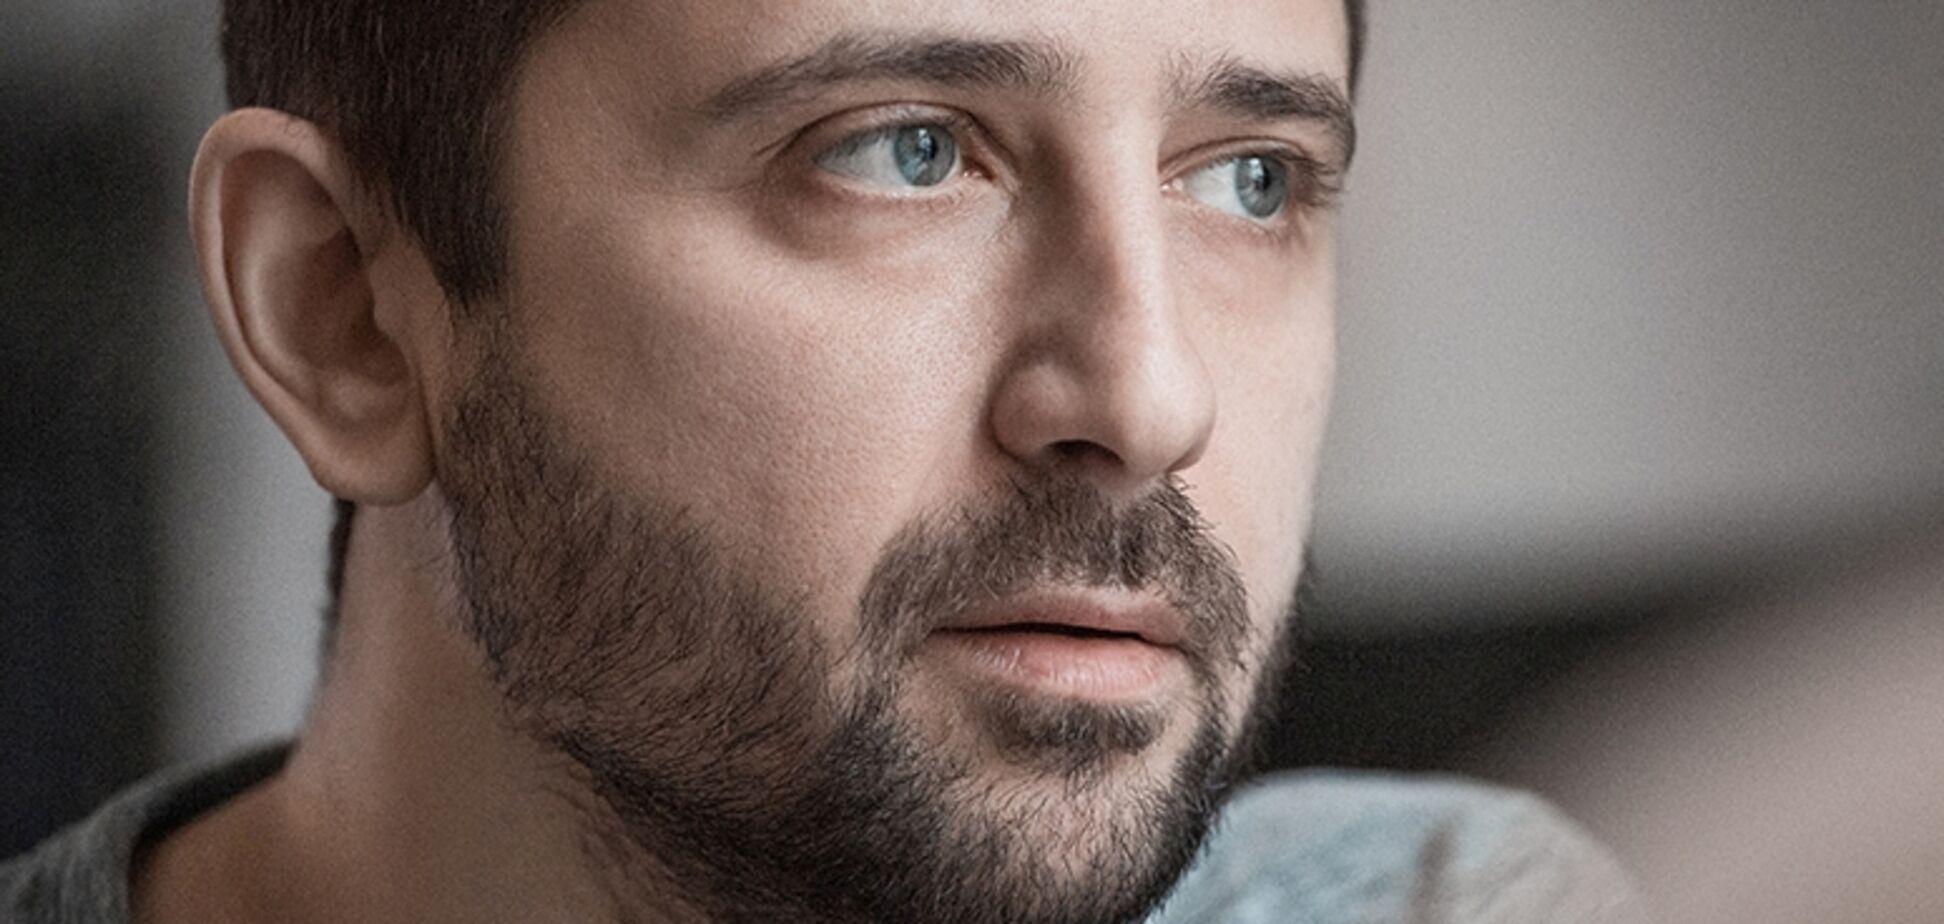 'Америка - не манна небесная, но...' Шабанов указал на важный недостаток украинцев